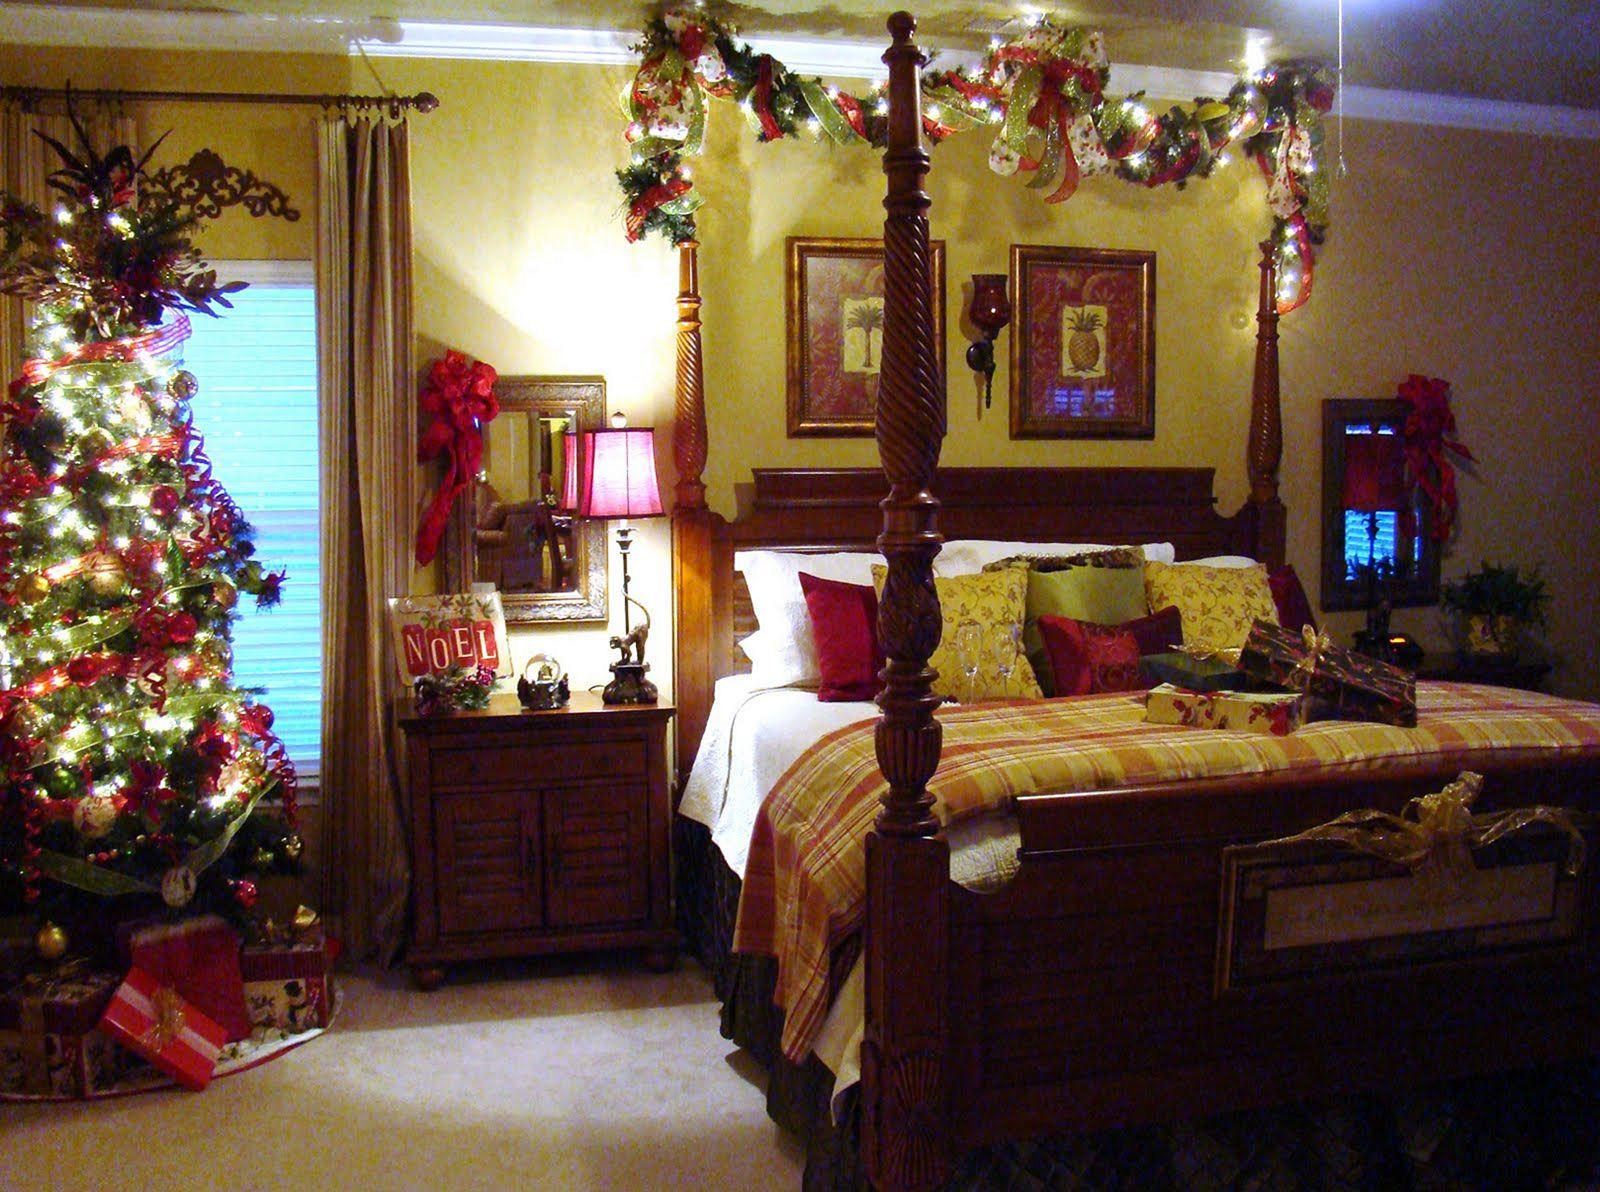 surprising christmas bedroom decorations ideas | Master Bedroom Decorating Ideas Christmas – DECOREDO